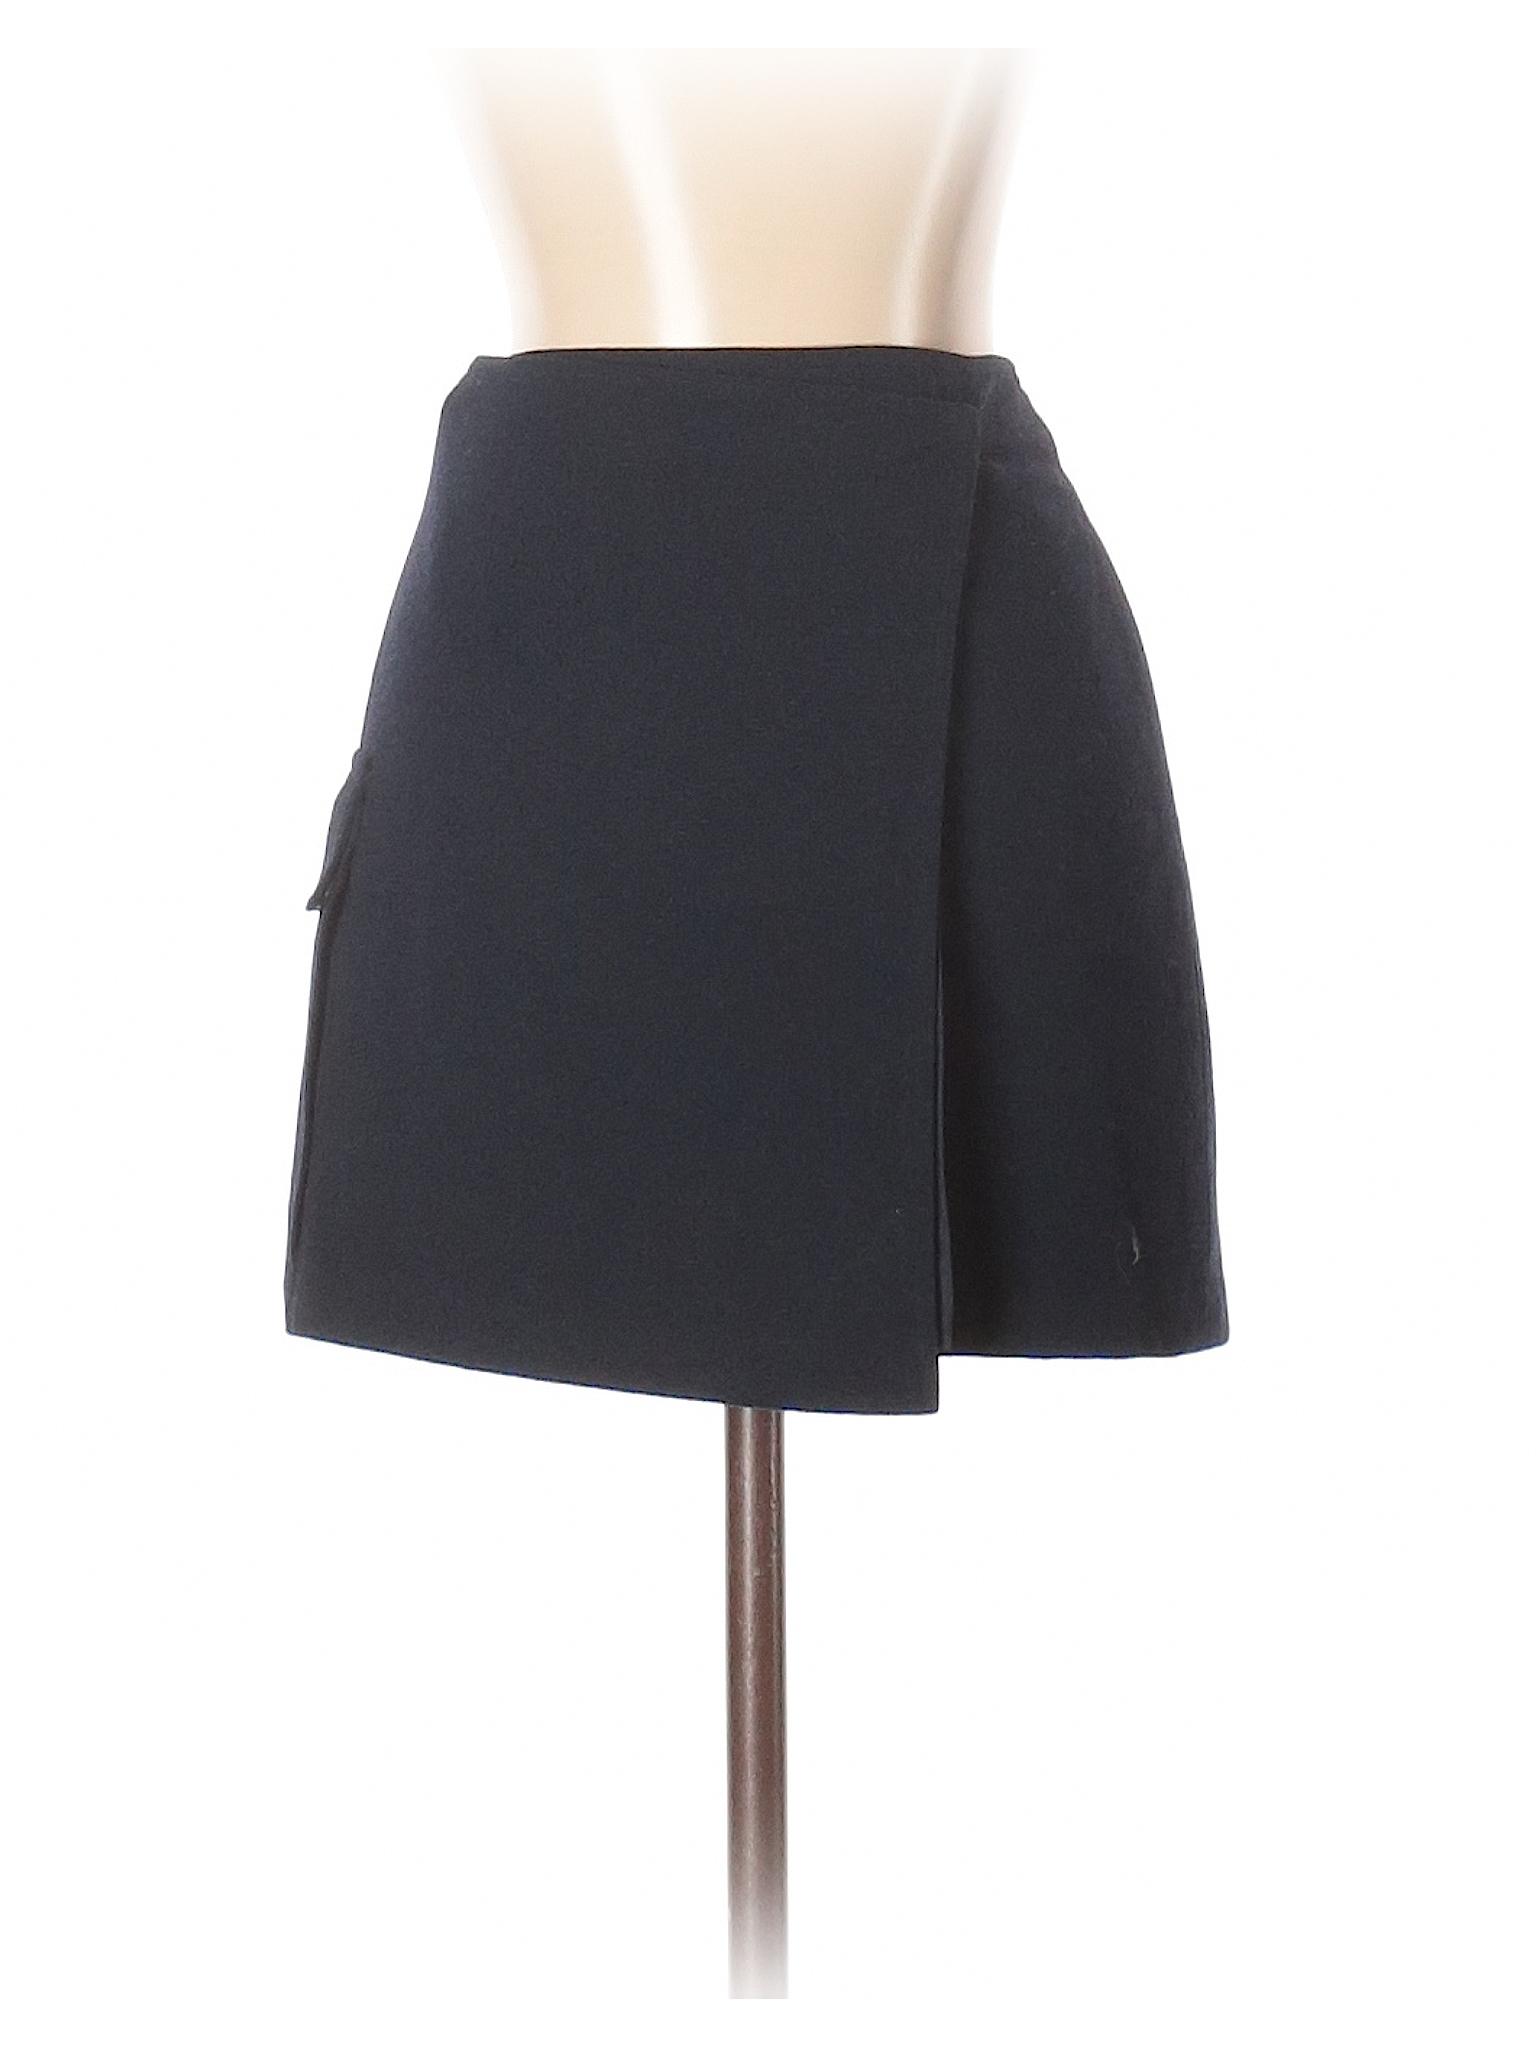 Boutique Casual Skirt Casual Boutique Skirt Skirt Boutique Casual wRqU8p